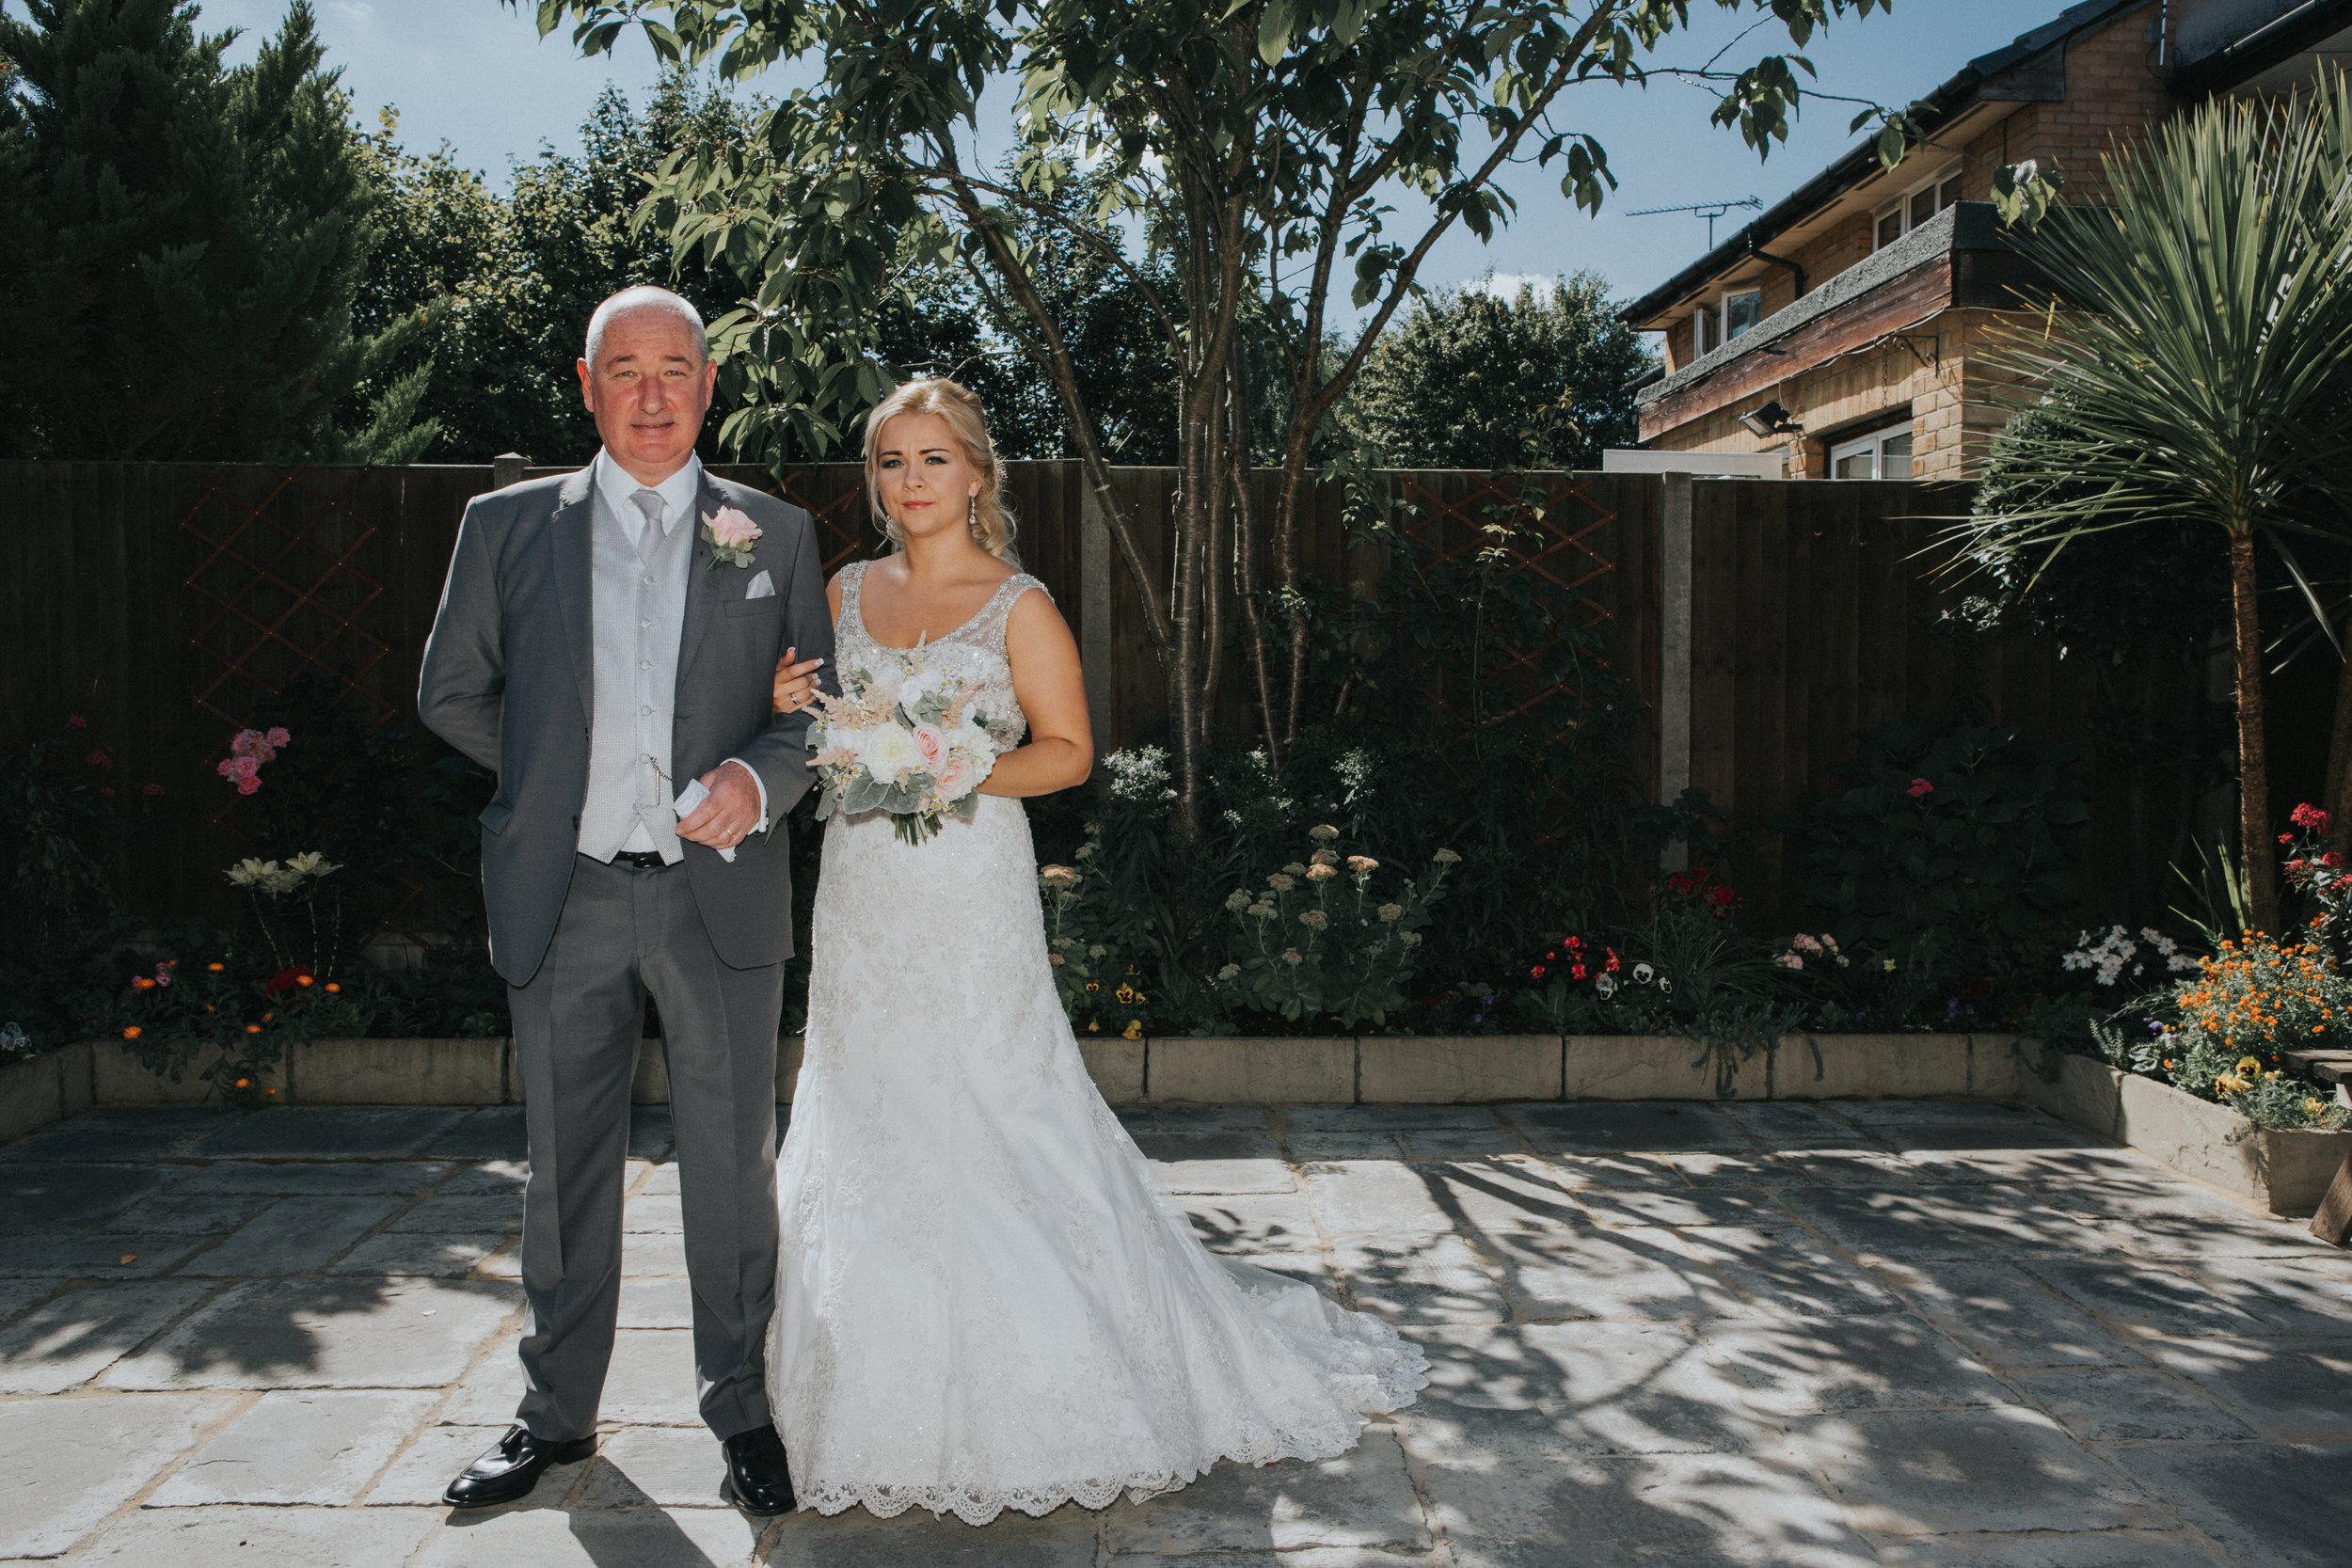 hitchin-hertfordshire-london-wedding-photography-st-bonaventures-catholic-church-bridal-prep-15